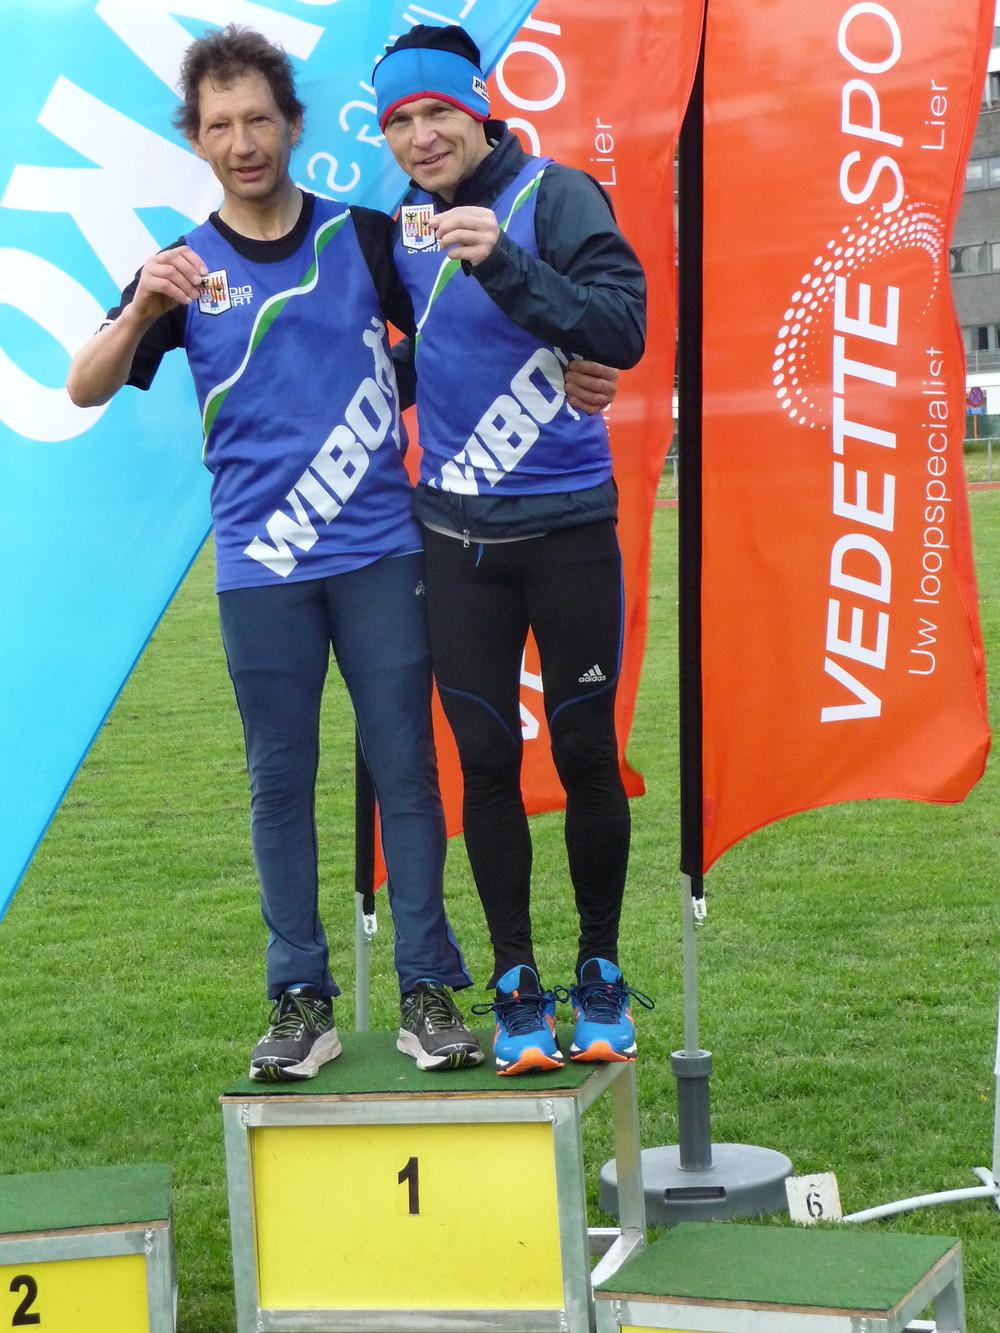 Cris Nauwelaers en Marc Borms, provinciaal kampioen 10.000m!